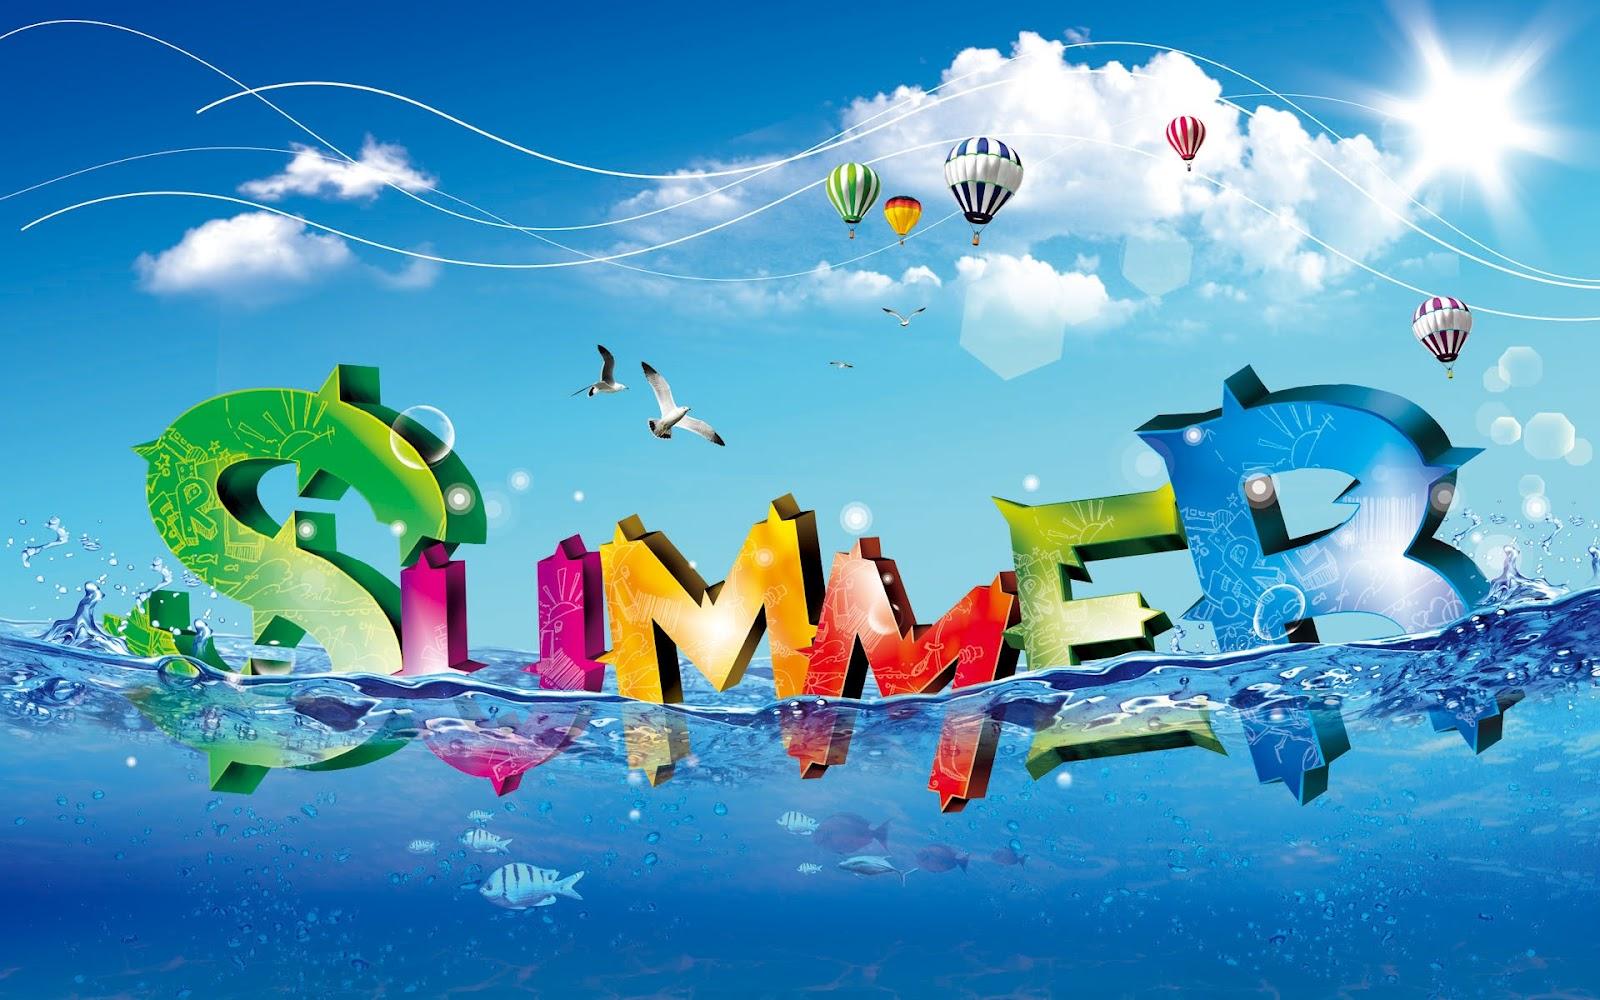 summer wallpaper summer beach wallpaper summer wallpaper for desktop 1600x1000